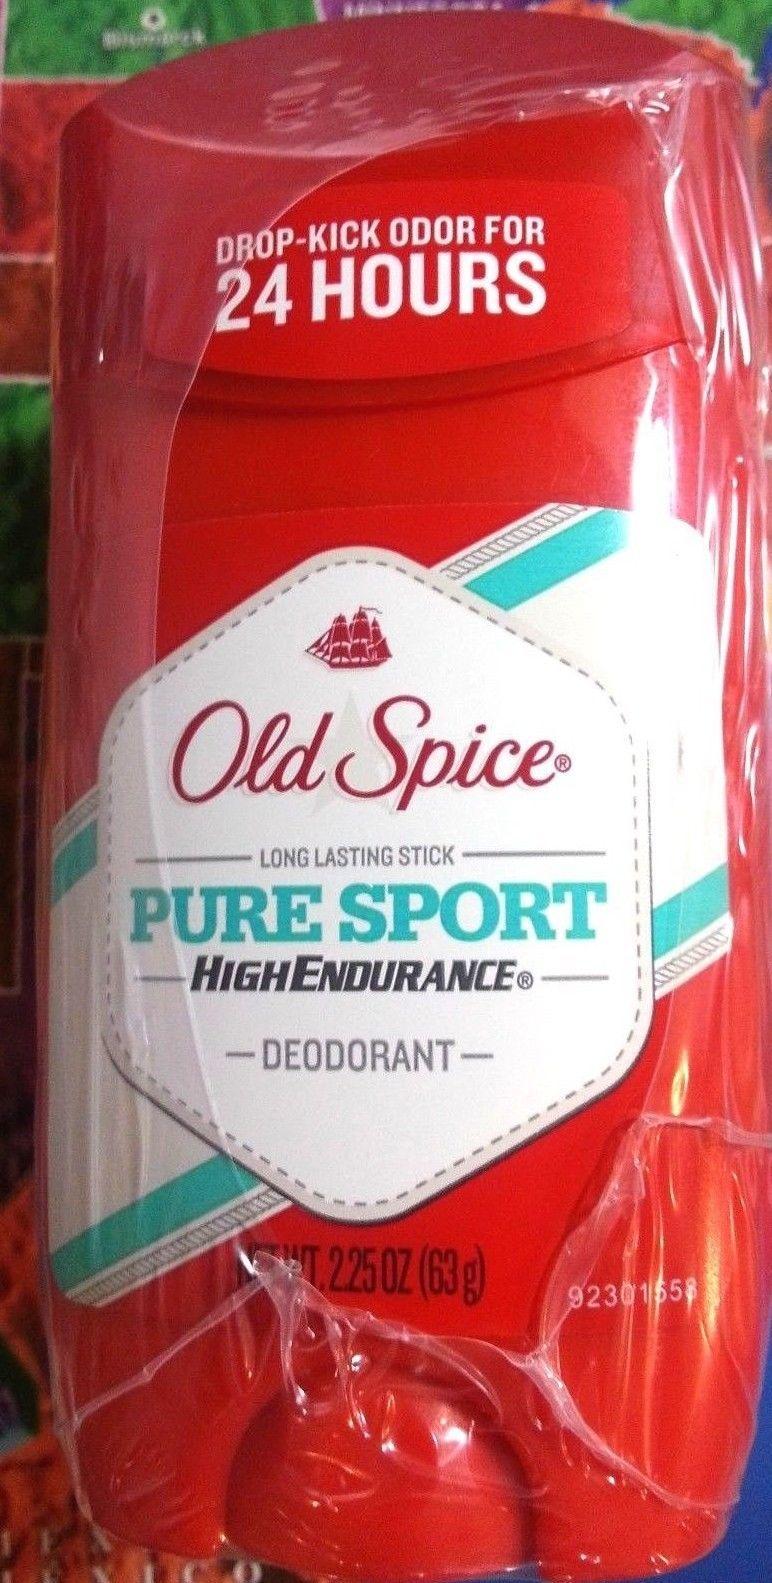 12 pk Old Spice Pure Sport High Endurance Deodorant 2.25 oz each Odor Protection